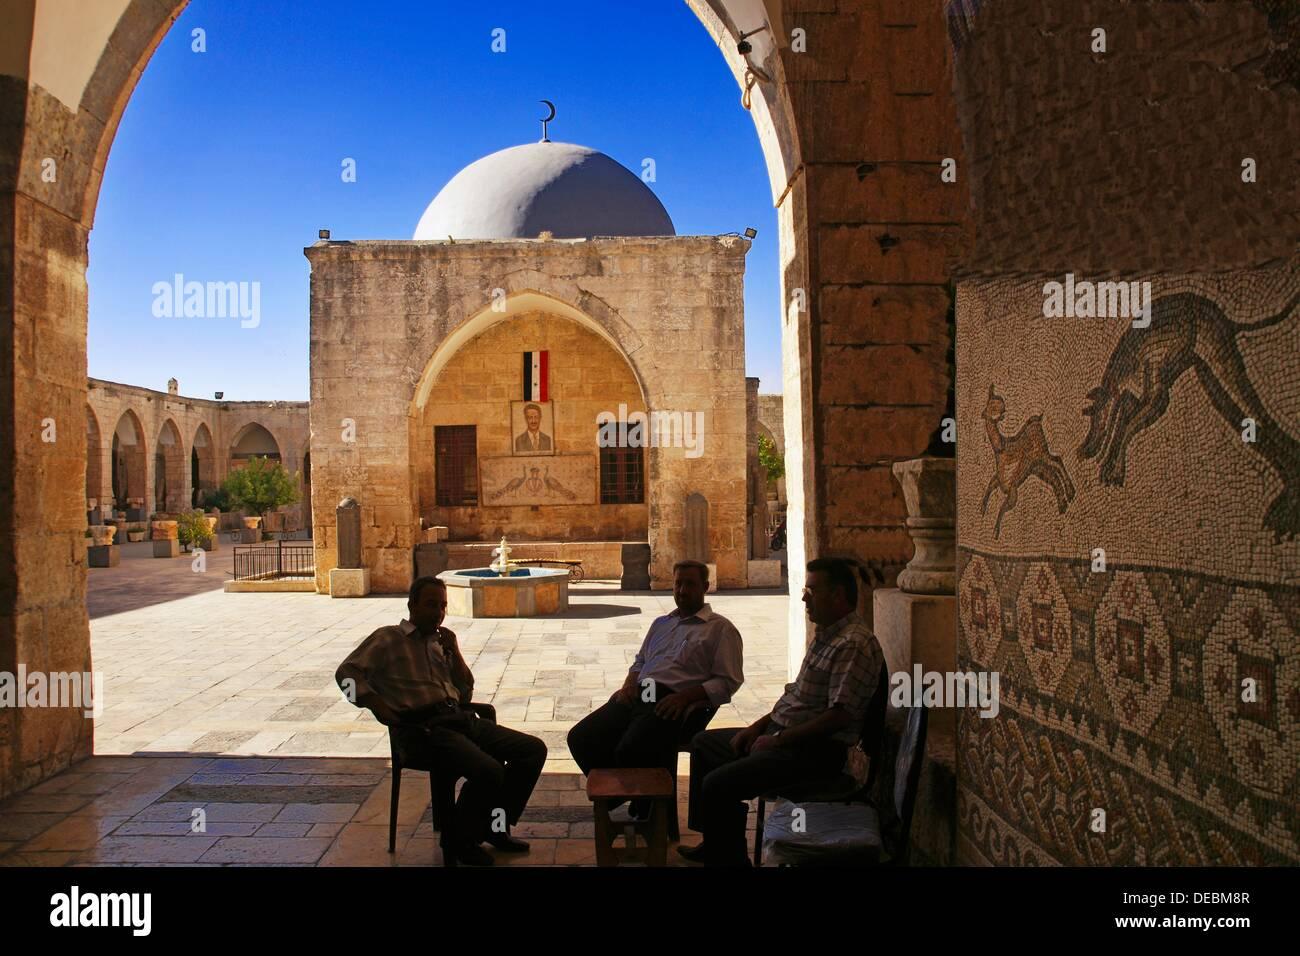 Inside the Khan Murat Basha (16th century) home to the city museum, Maarat al-Numaan, Syria - Stock Image